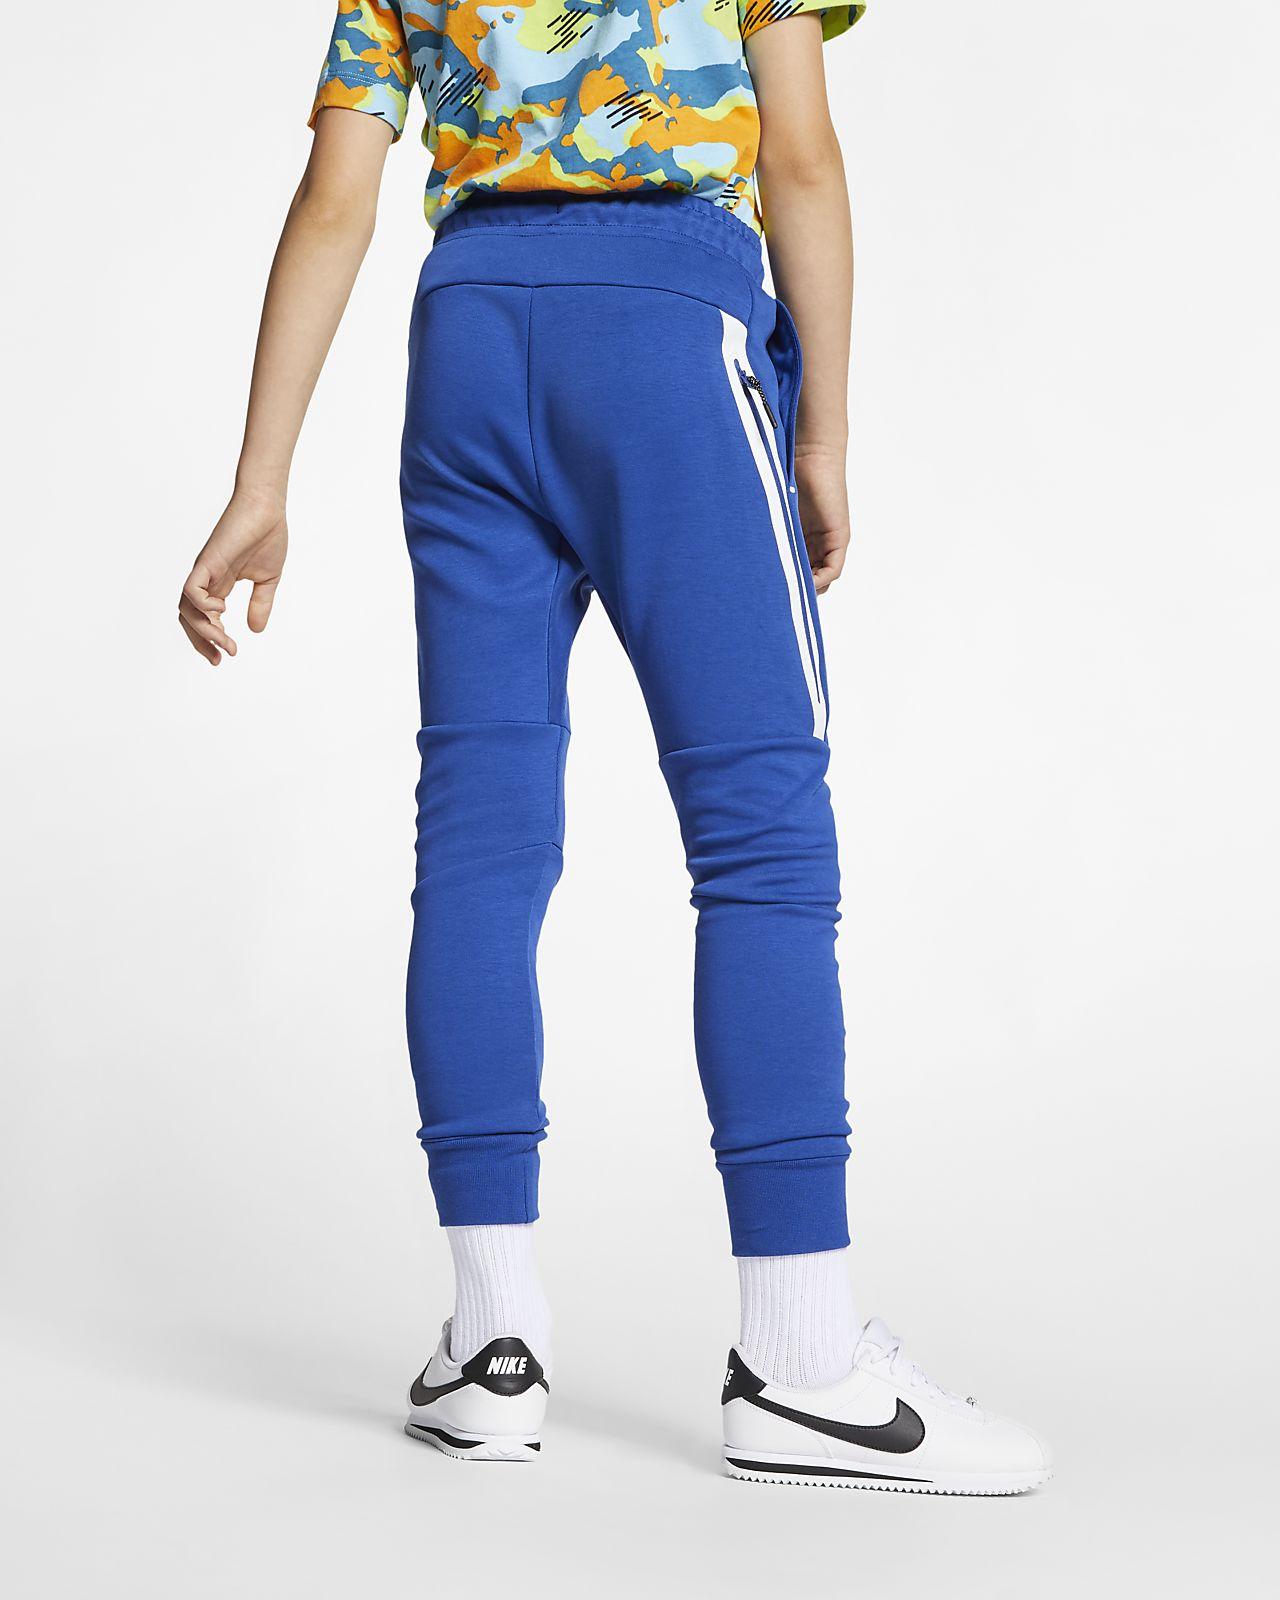 9afe0318cc9ac Nike Sportswear Big Kids' Tech Fleece Pants. Nike.com